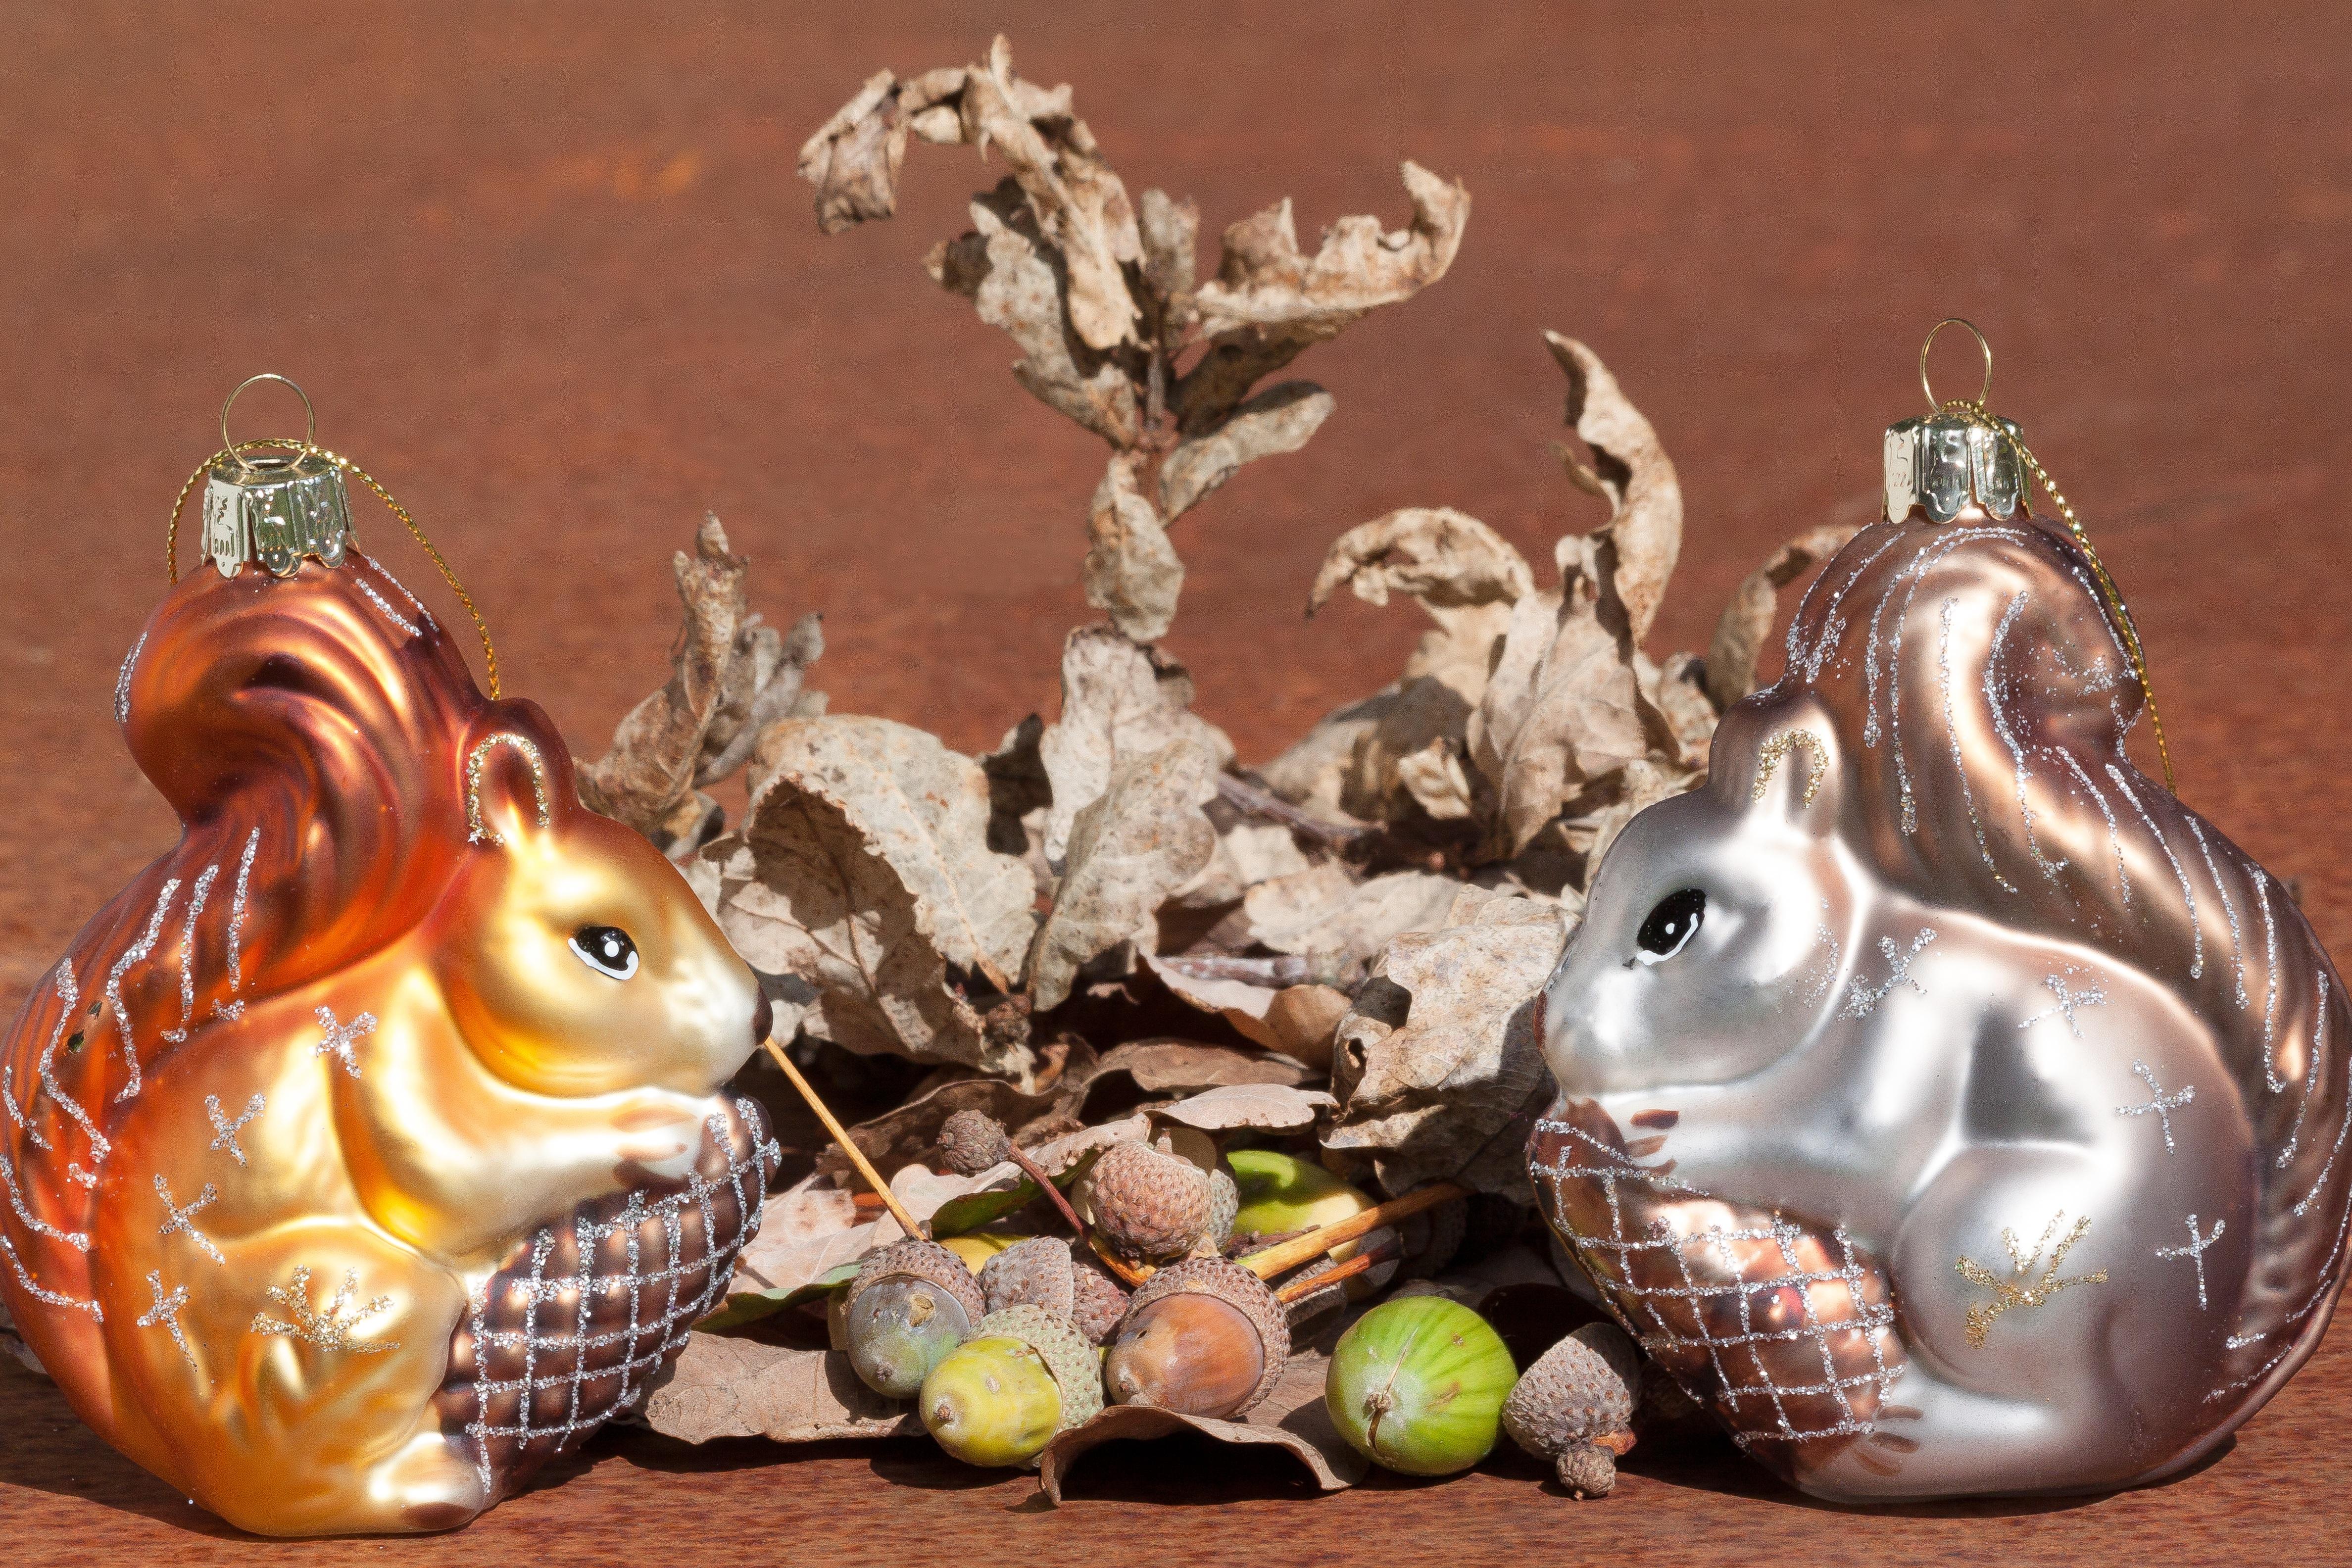 Free Images : nature, autumn, squirrel, hipster, figurine, chipmunk ...